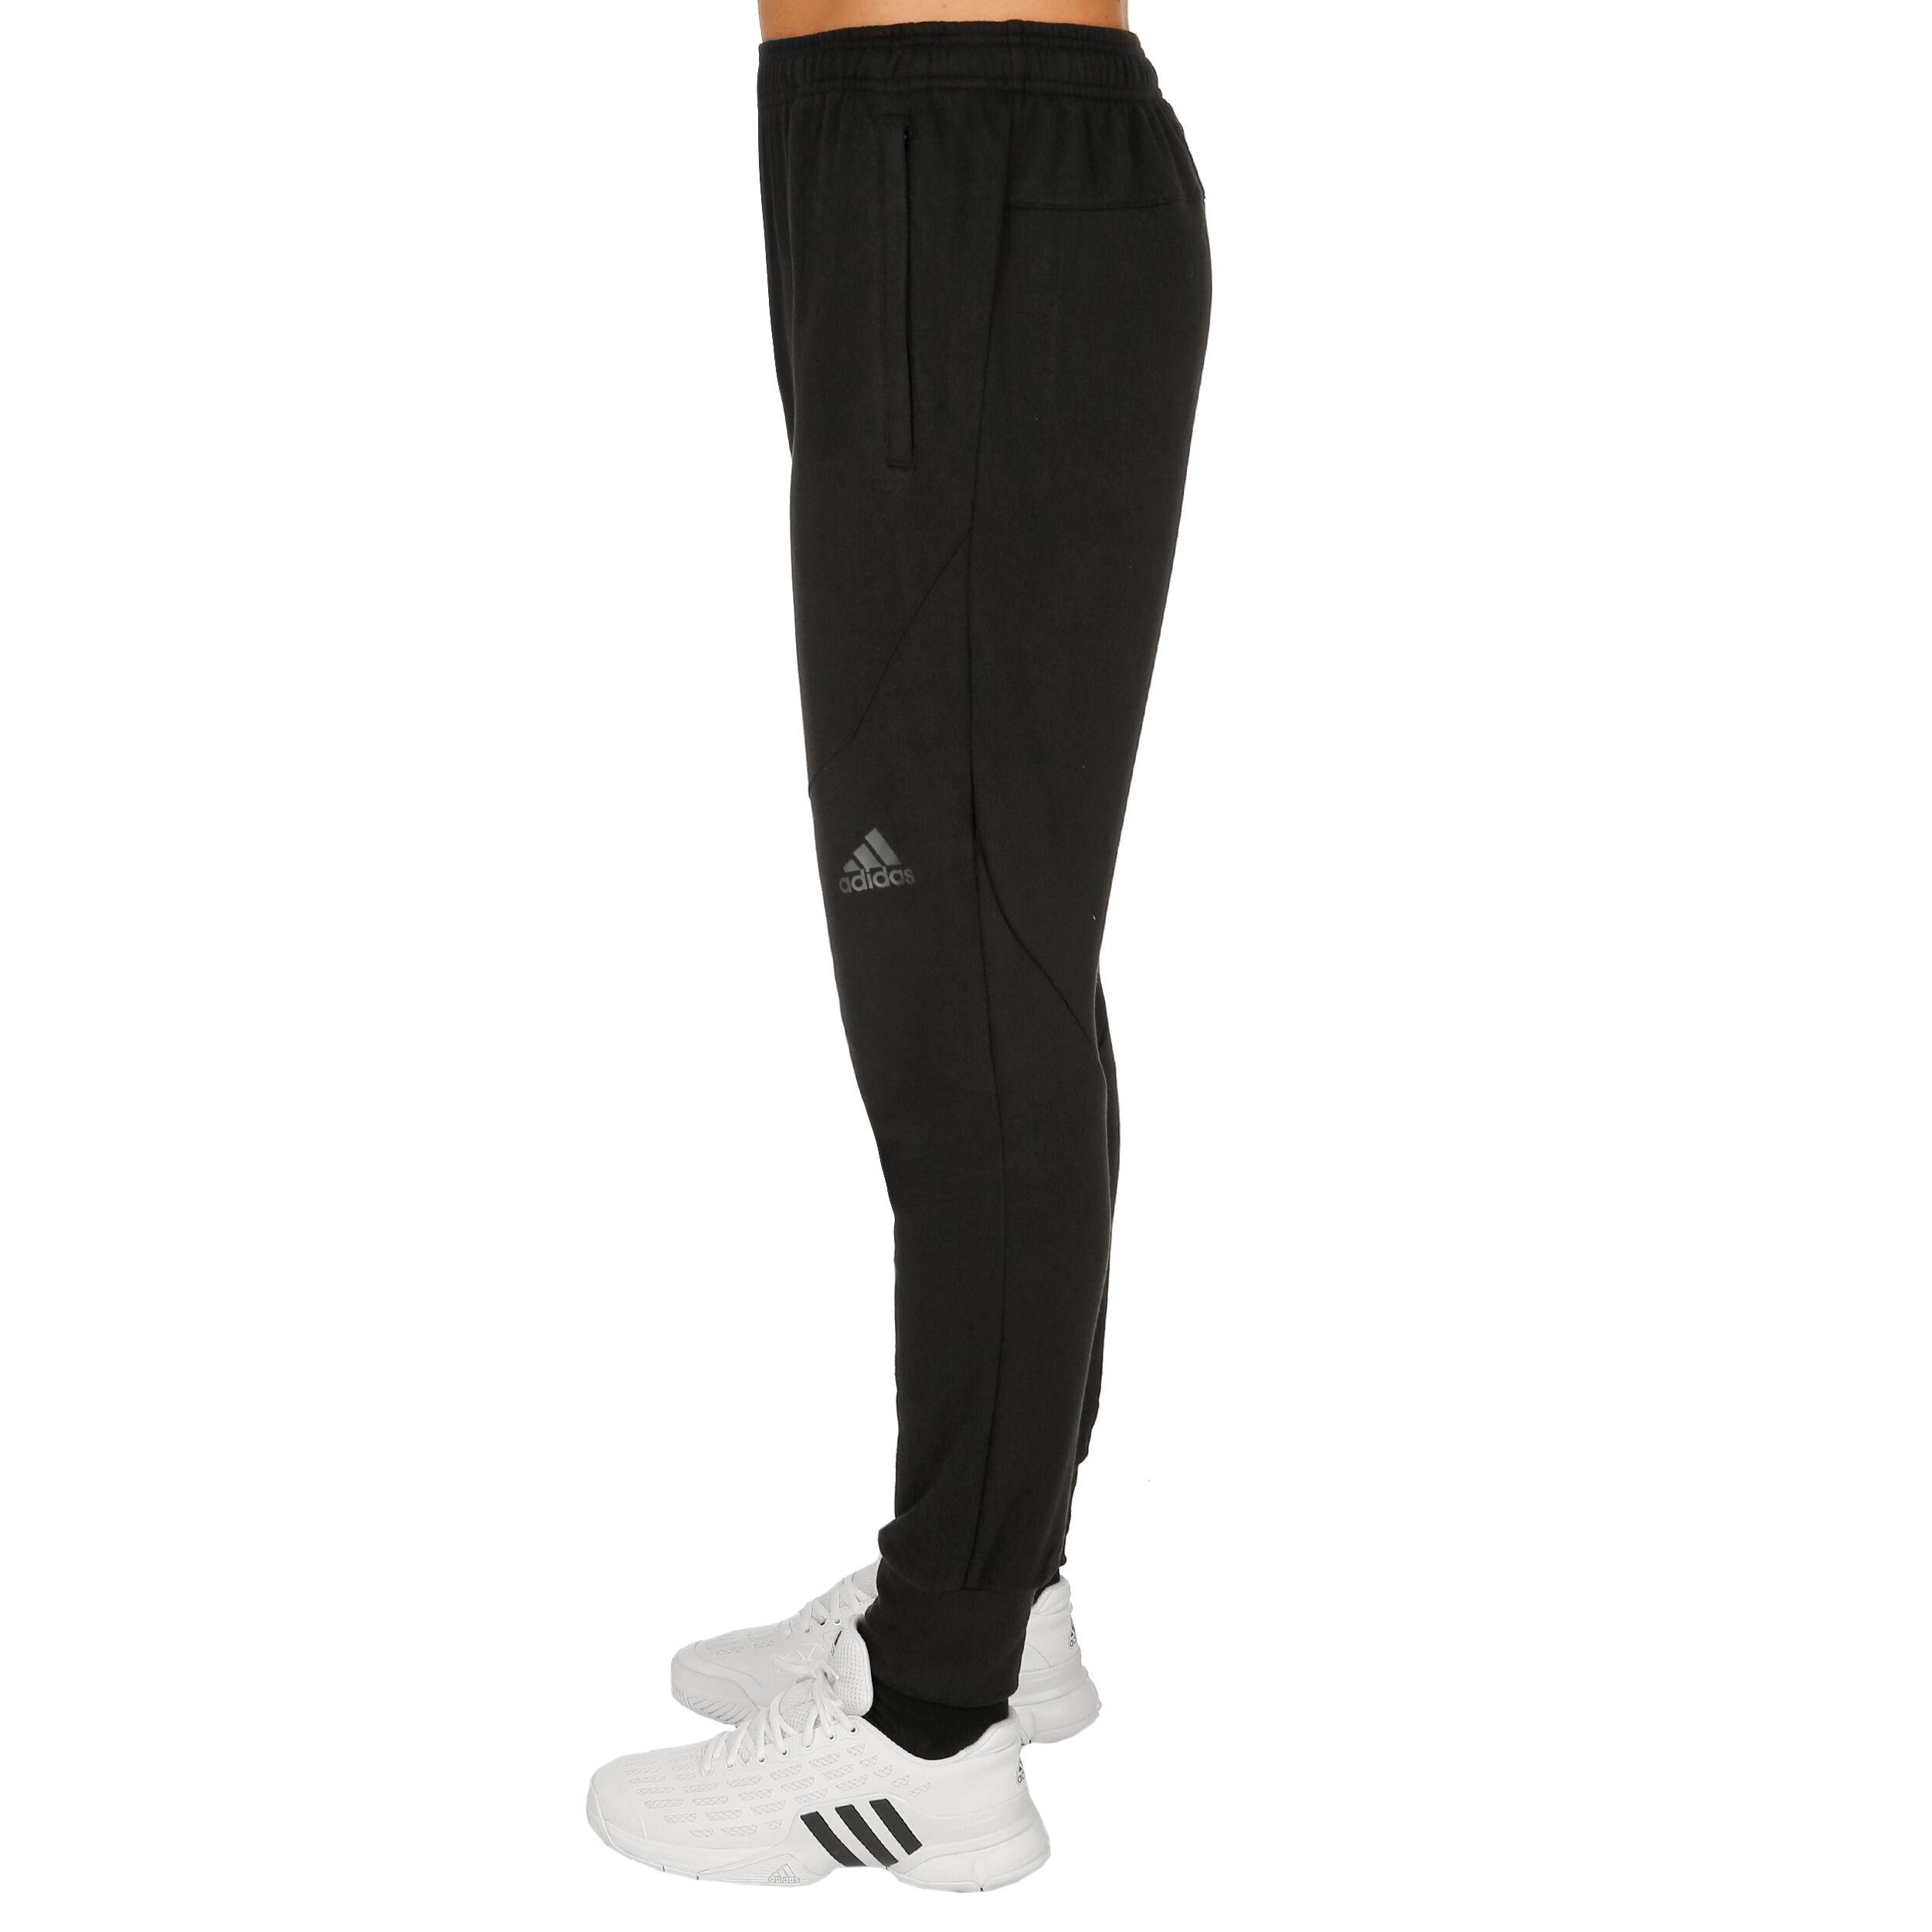 adidas Prime Trainingshose Herren Schwarz, Silber online